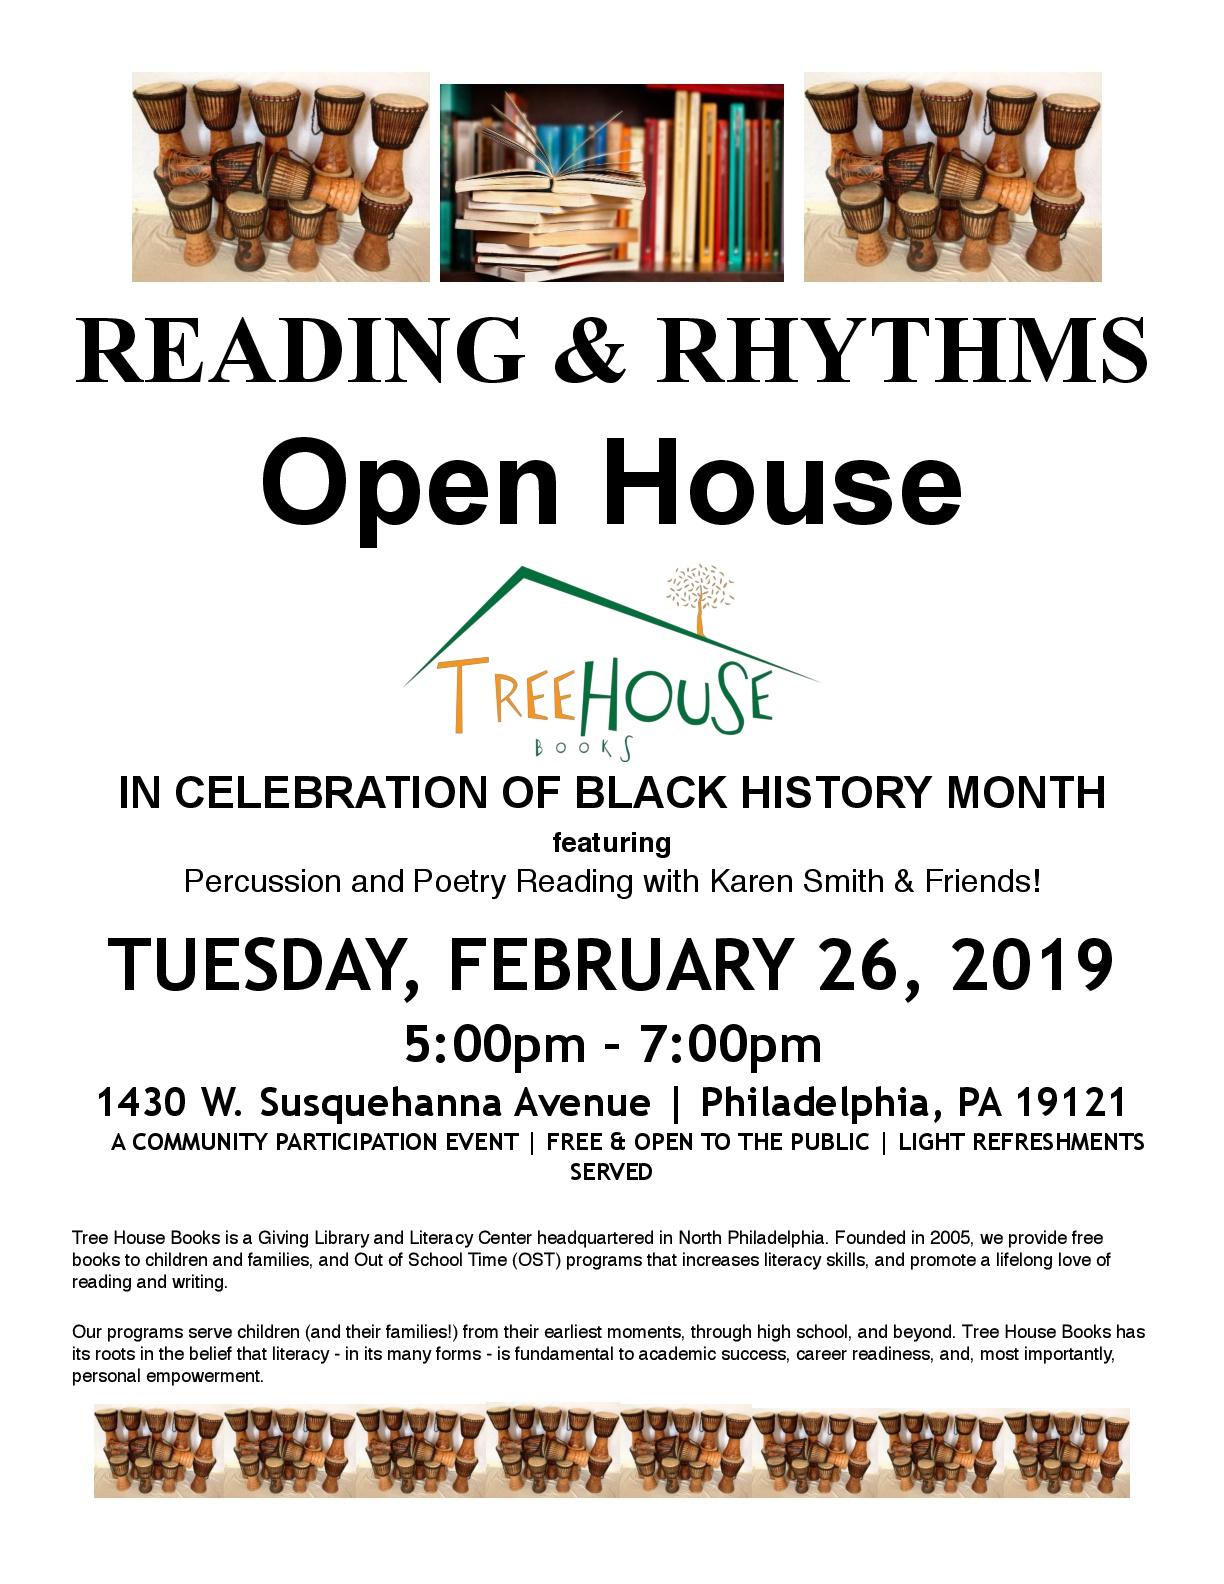 Sistahs-Laying-Down-Hands---Tree-House-Books---February-2019-(1)-4-001.jpg